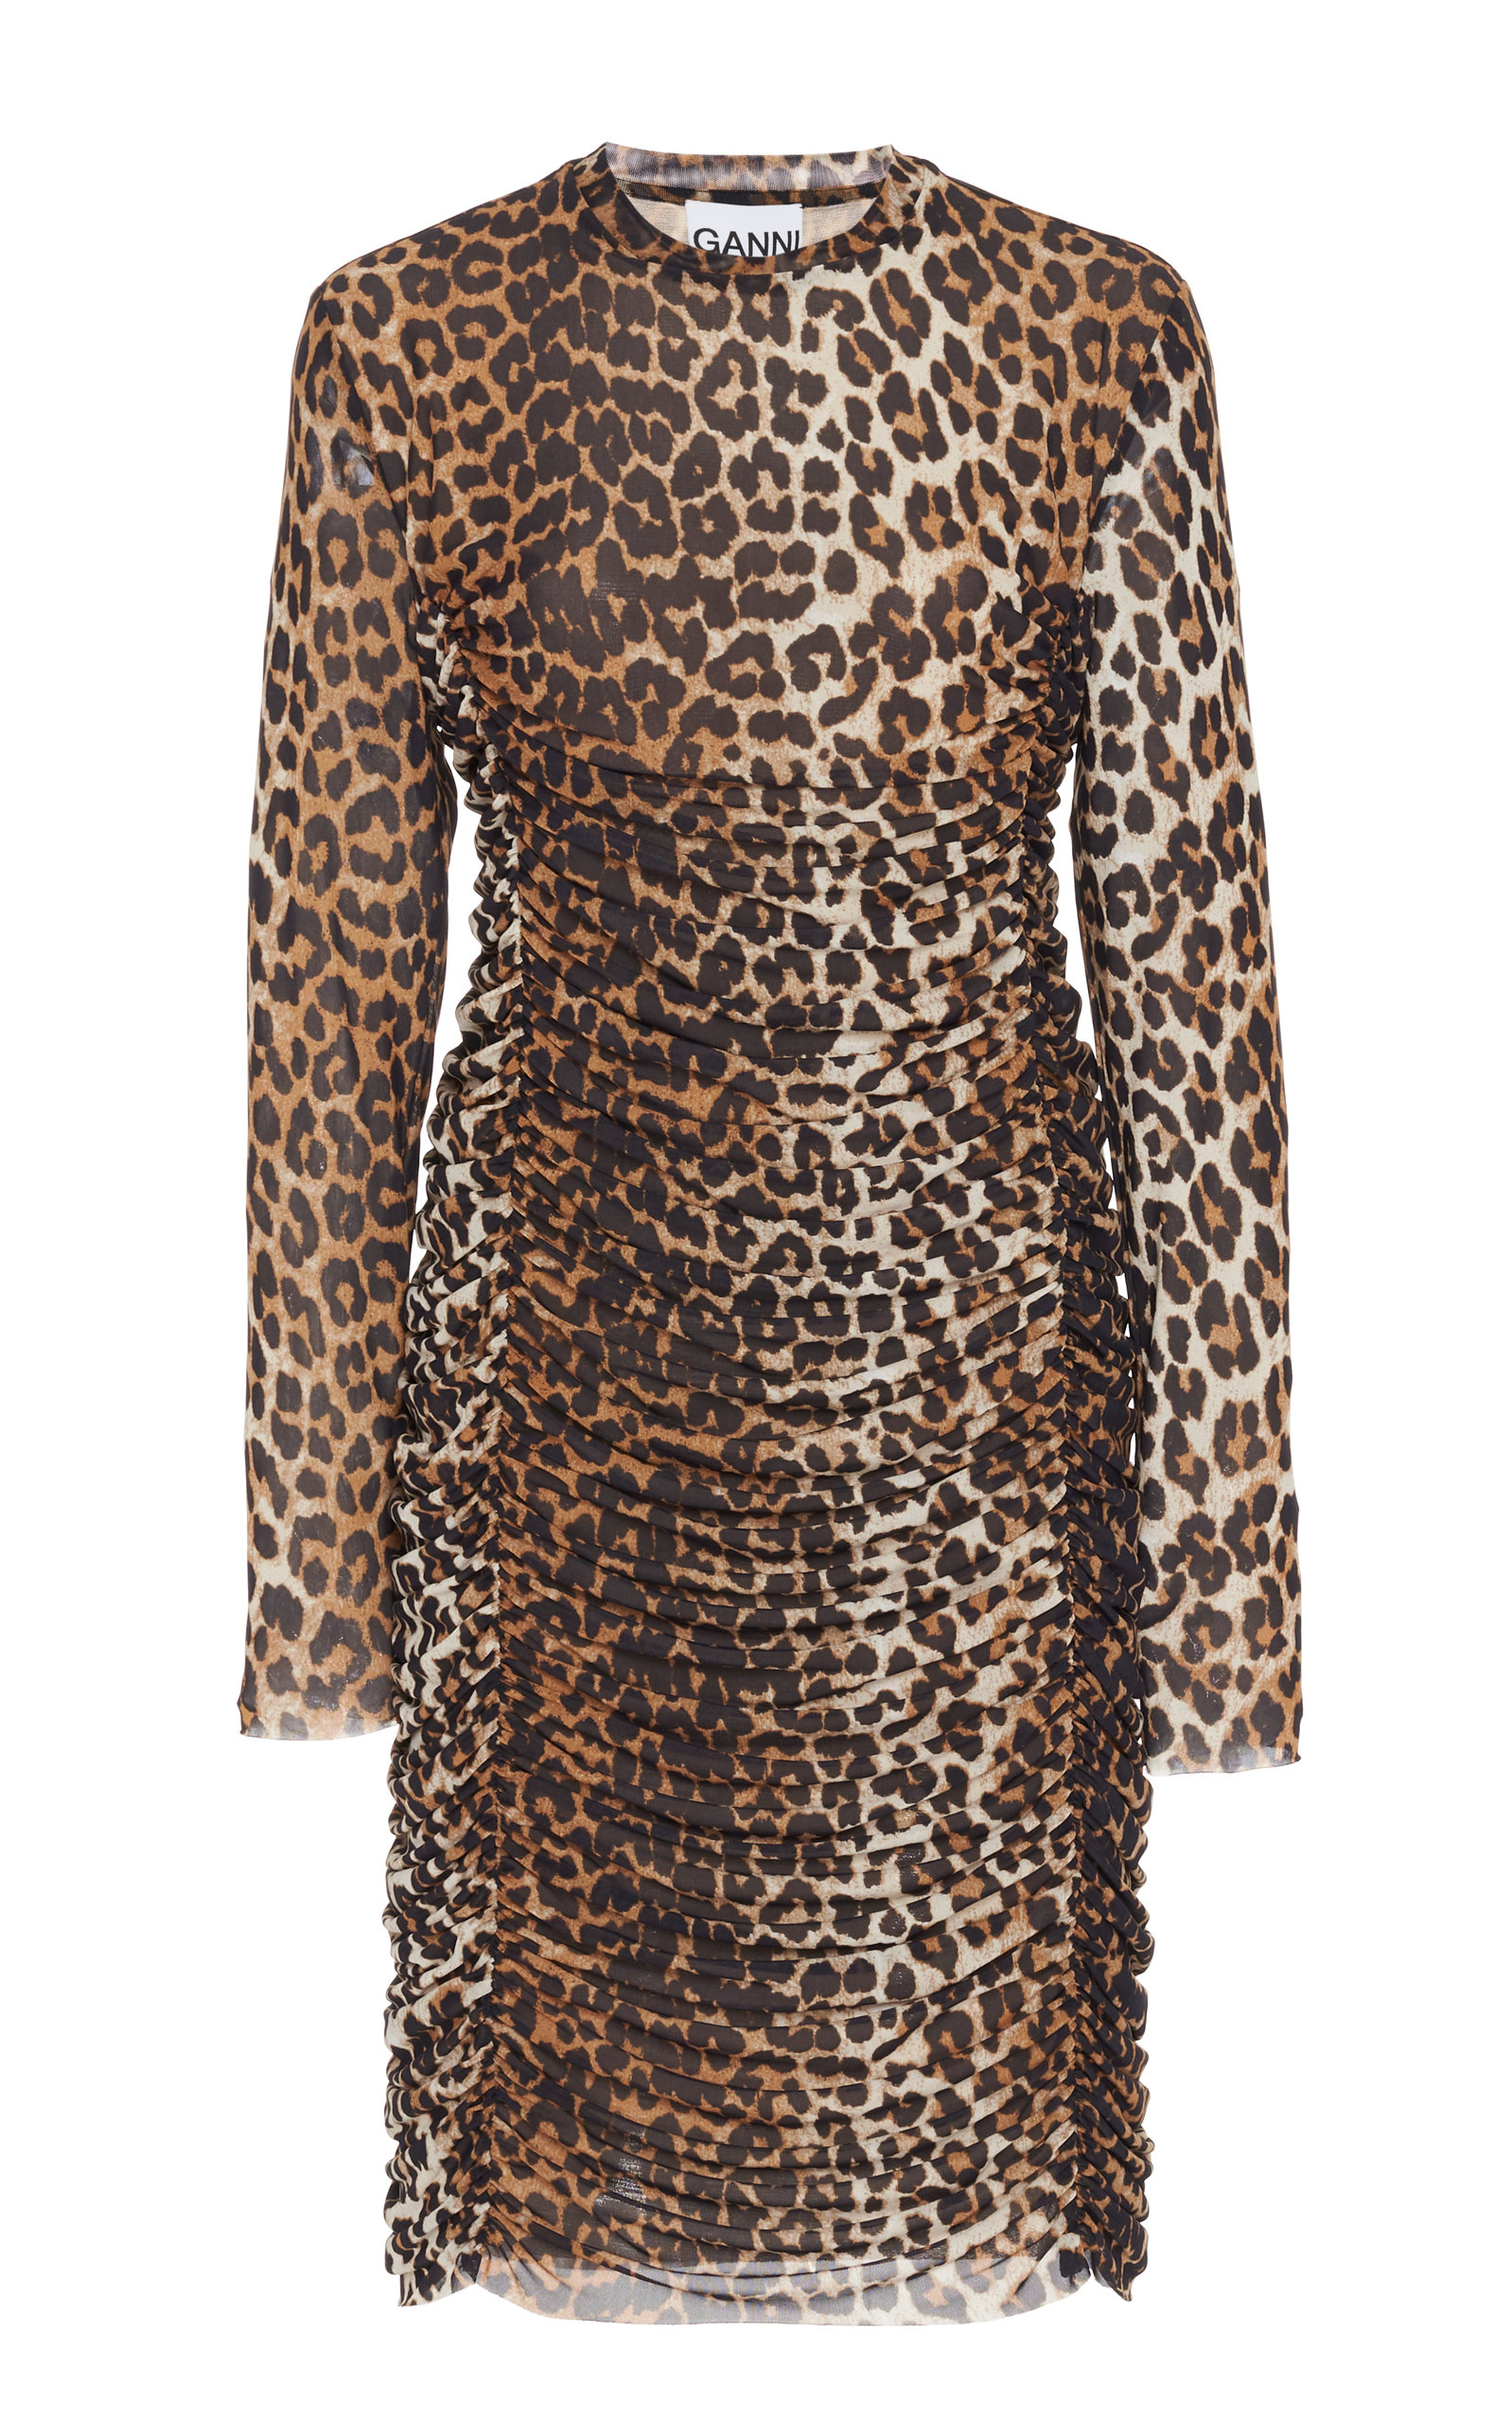 Buy Ganni Leopard-Print Ruched Mesh Dress online, shop Ganni at the best price